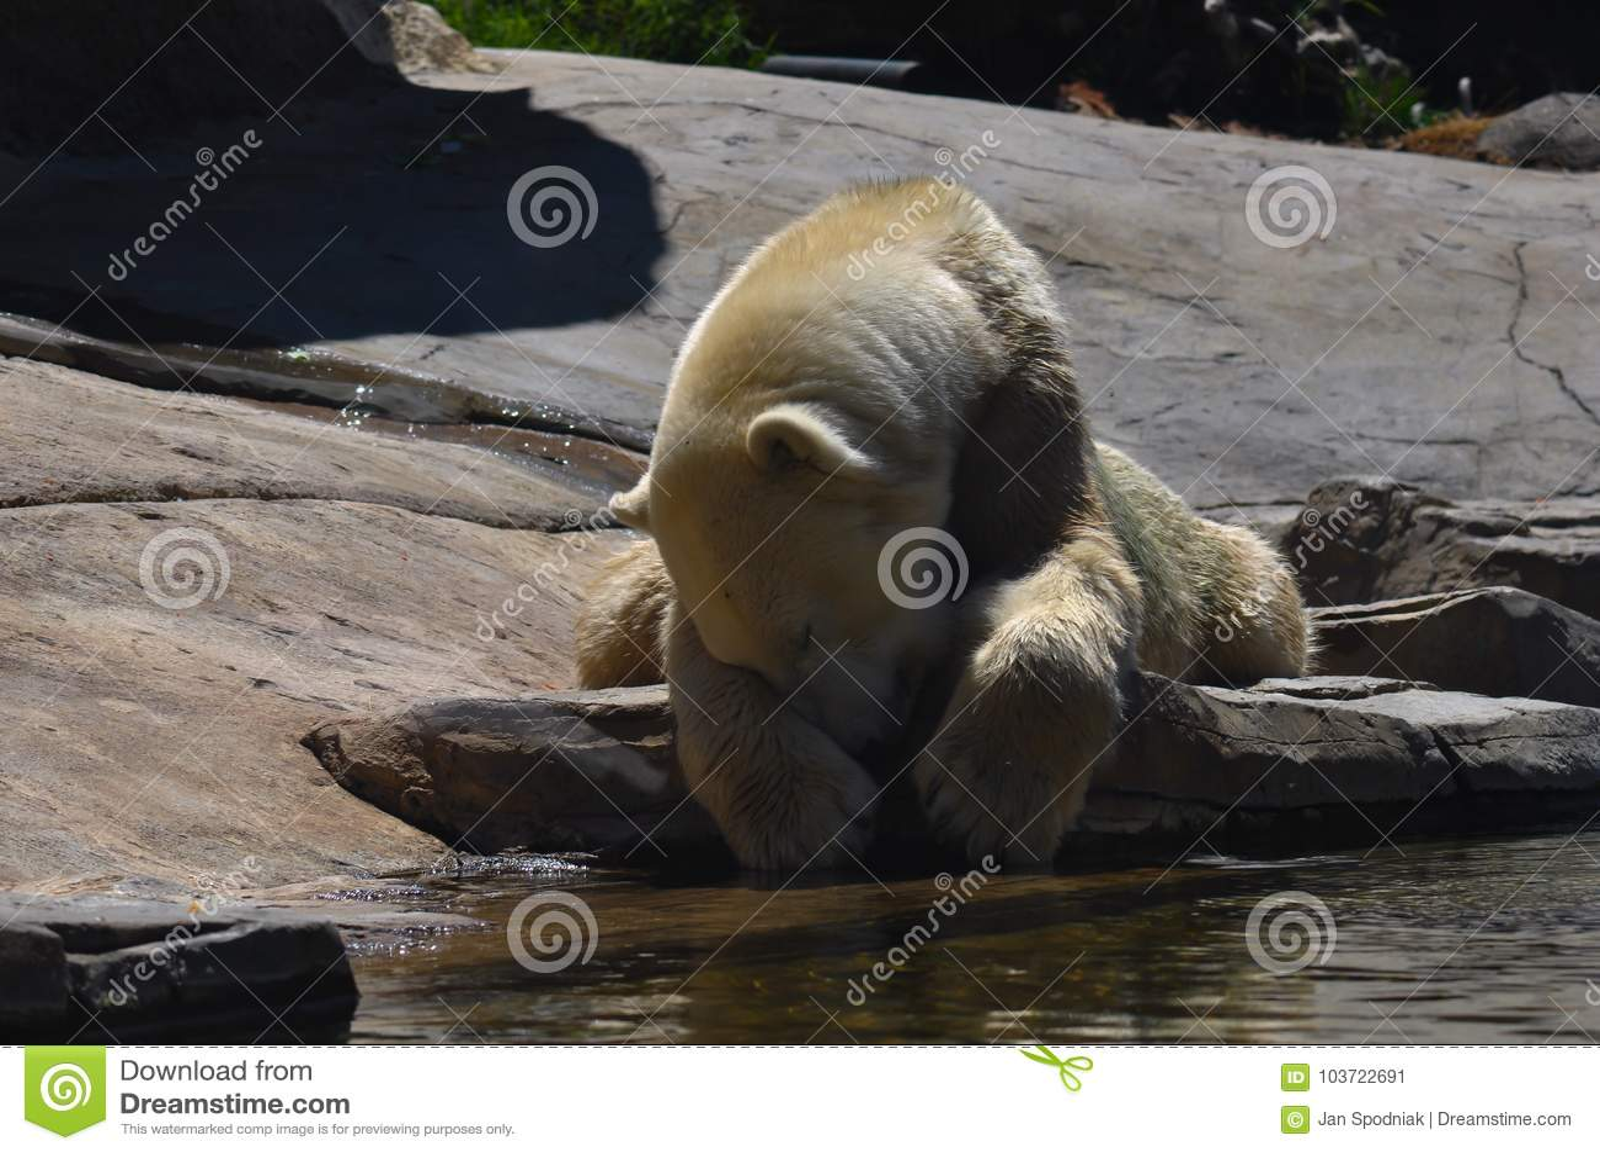 Polar bear lying on the rock